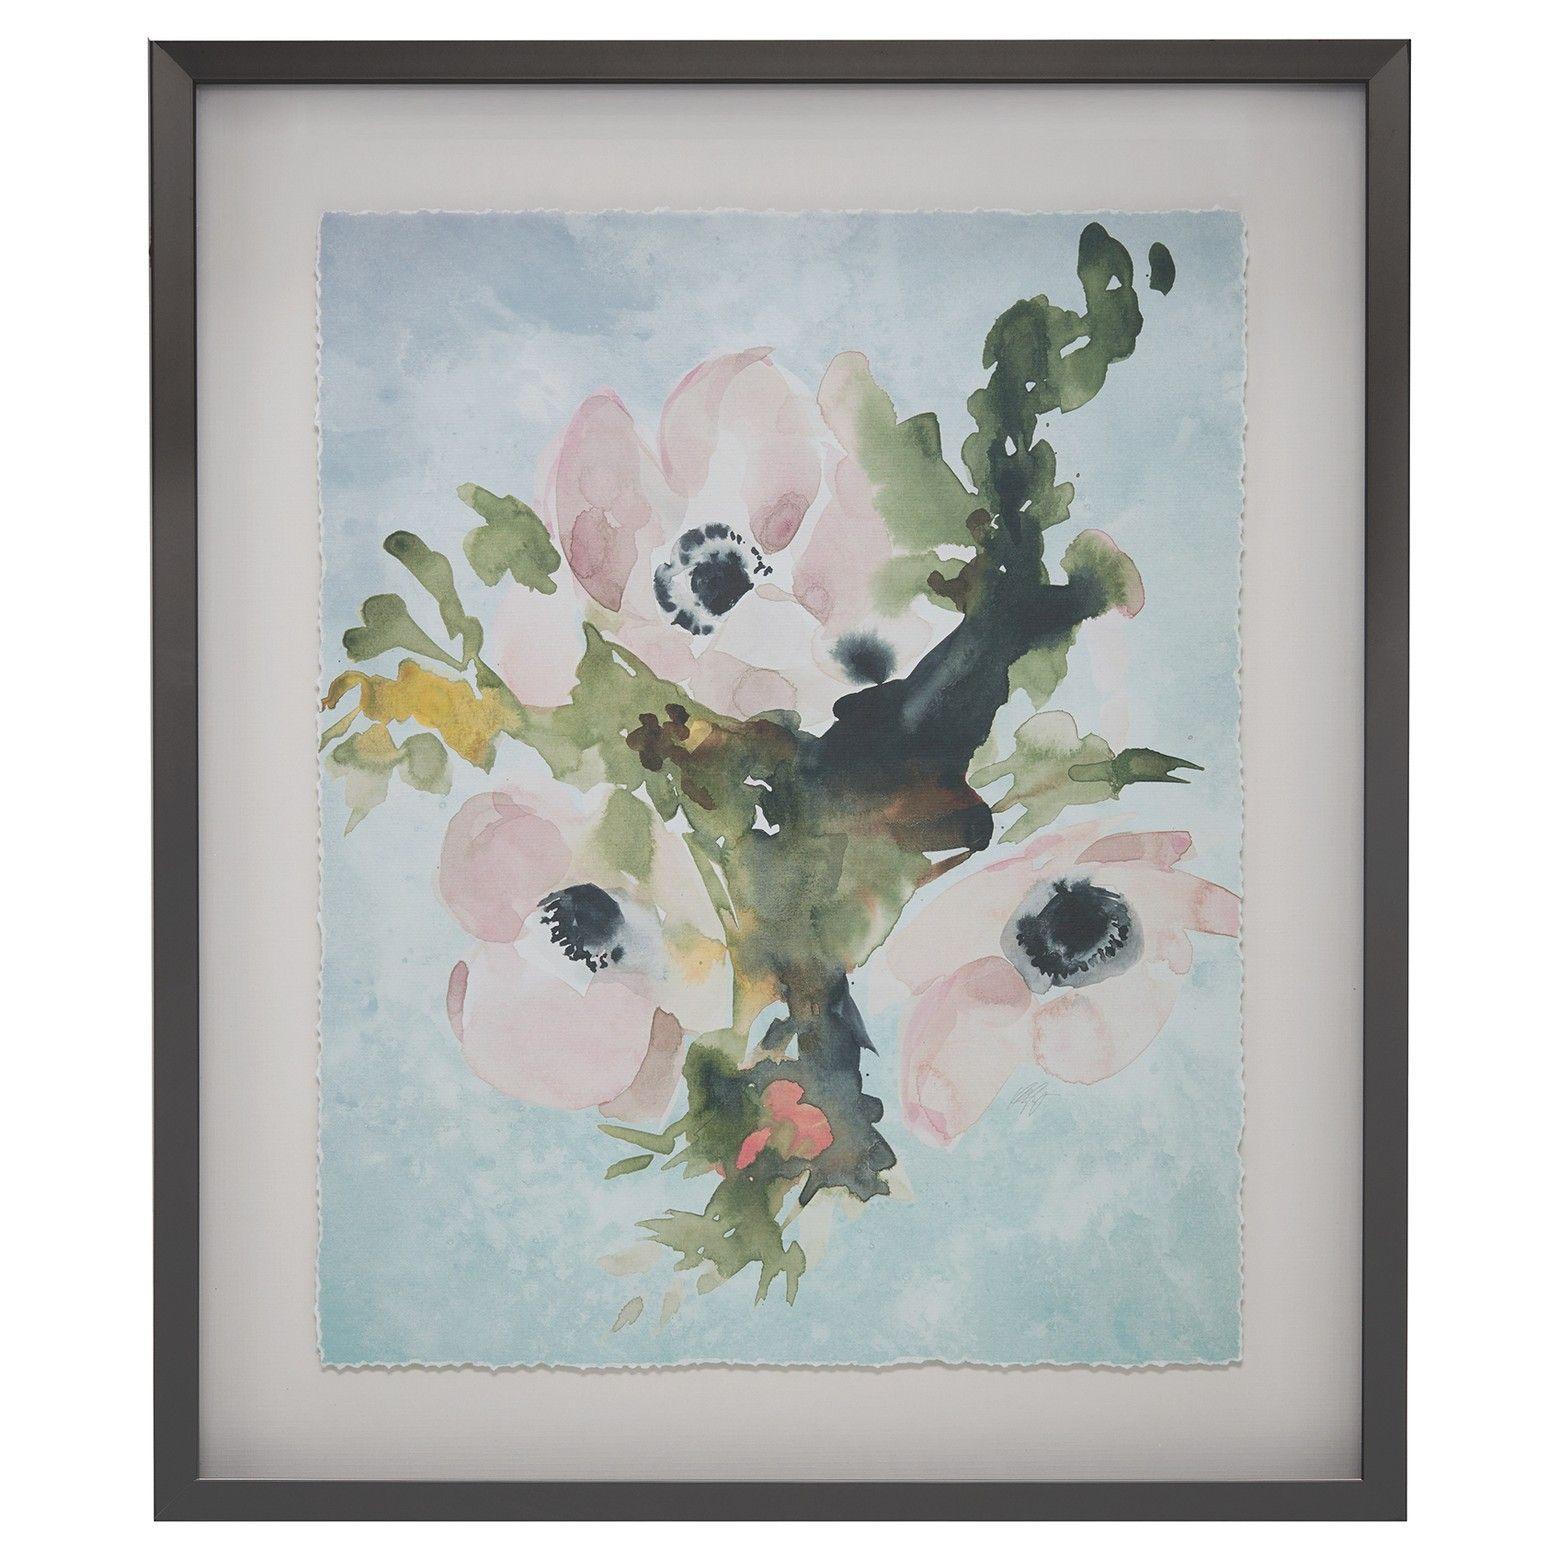 Winter Bouquet 1 Frame Art Canvas Is A Fresh Floral Arrangement In